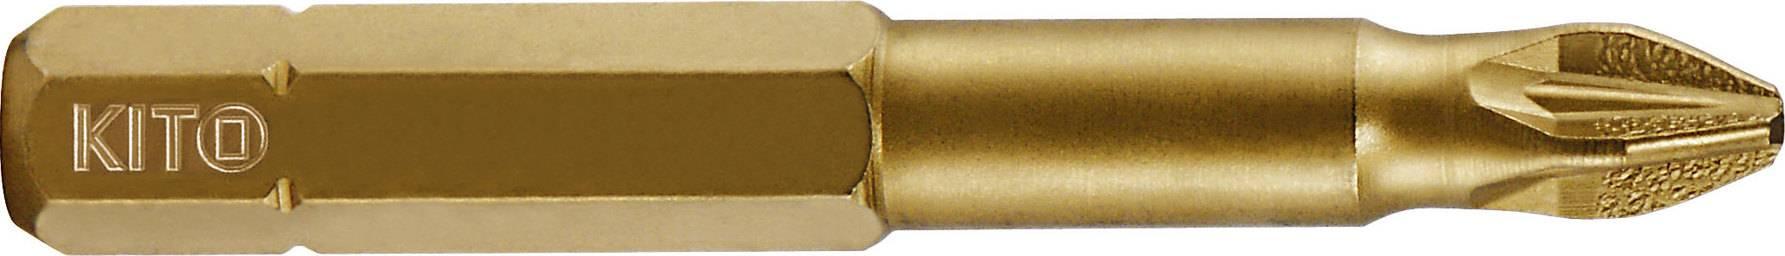 hrot, PZ 0x50mm, S2/TiN 4821200 KITO